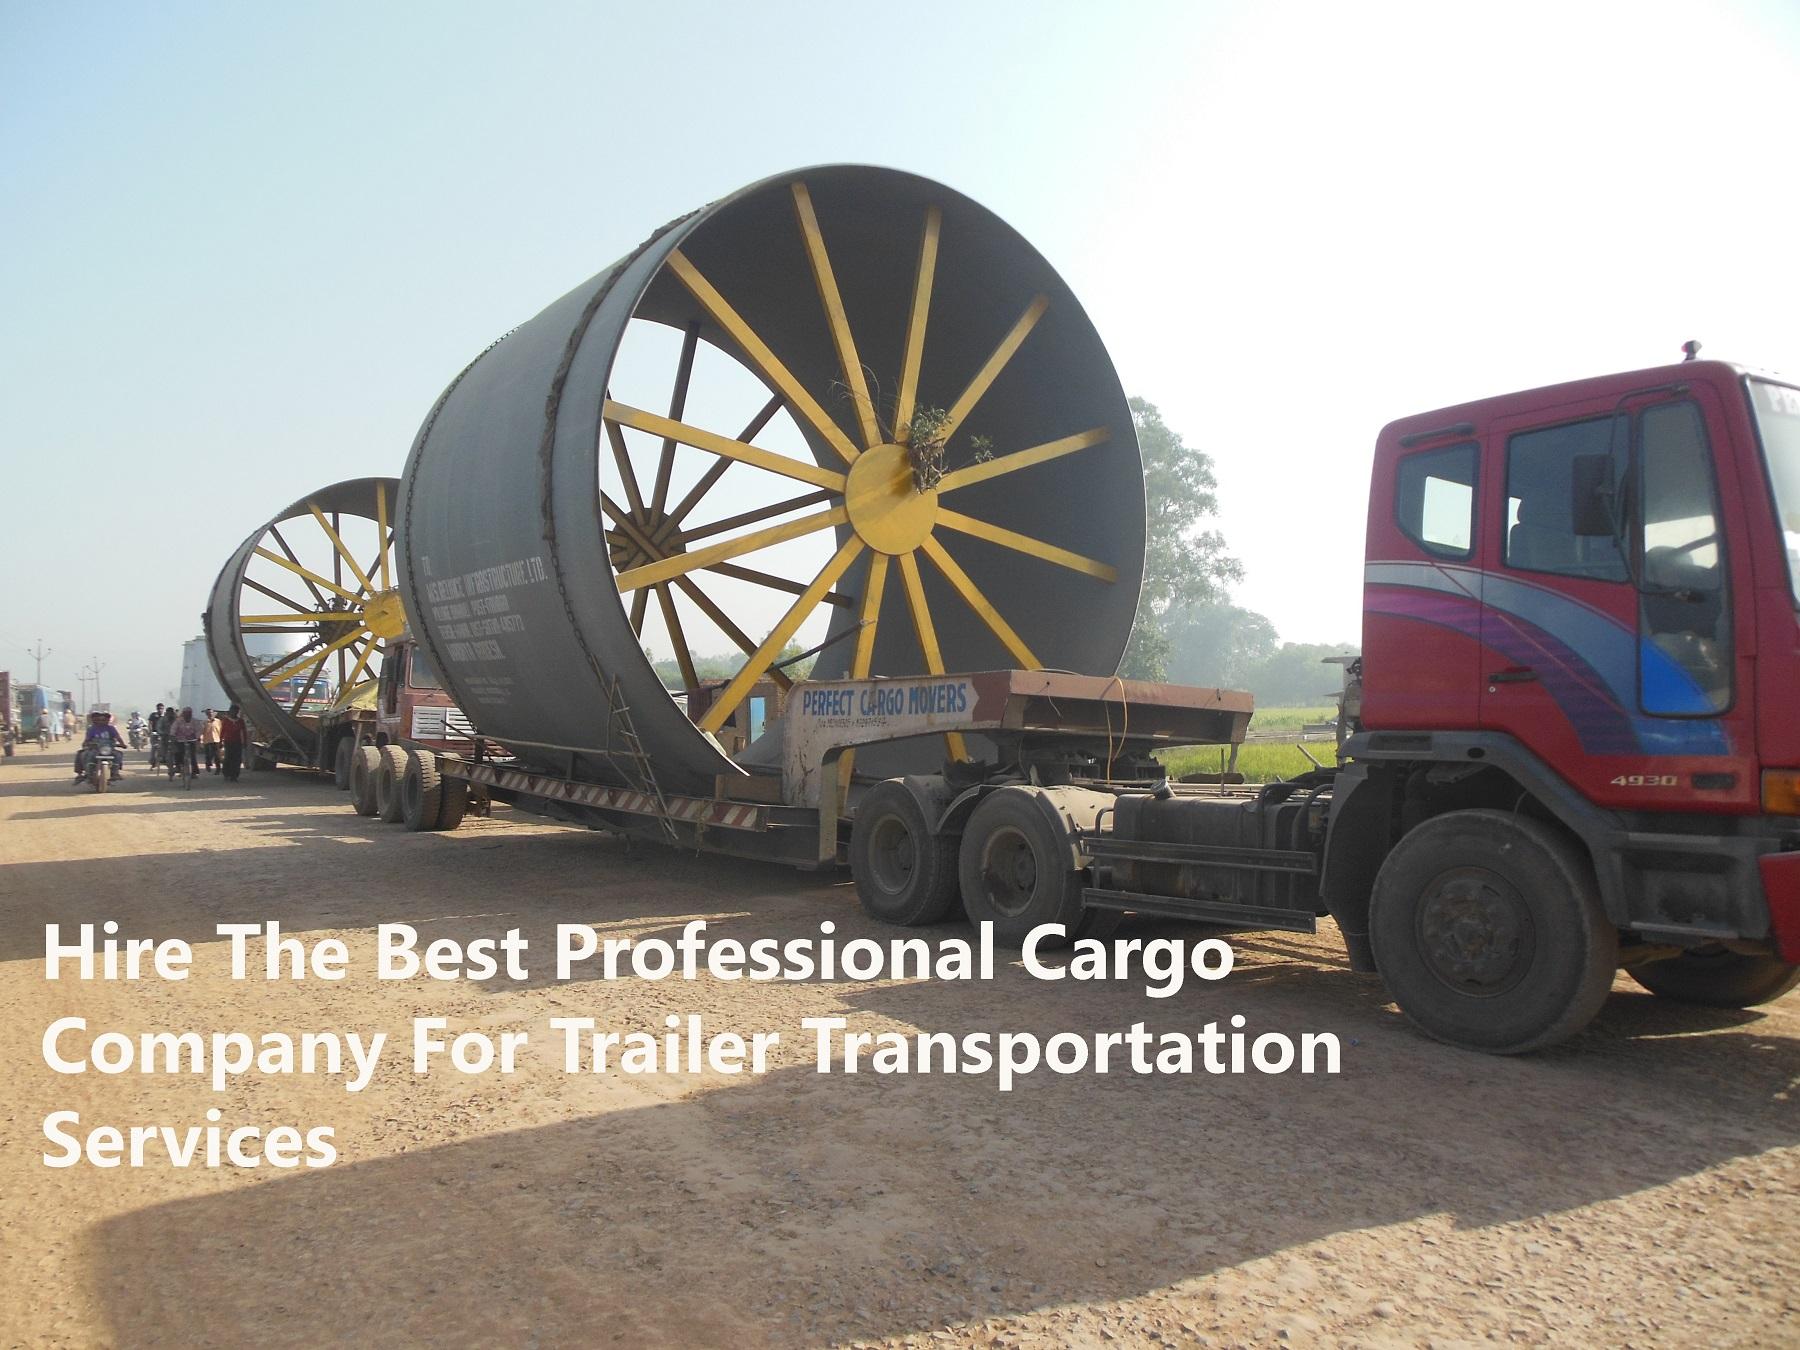 Best Professional Cargo Company